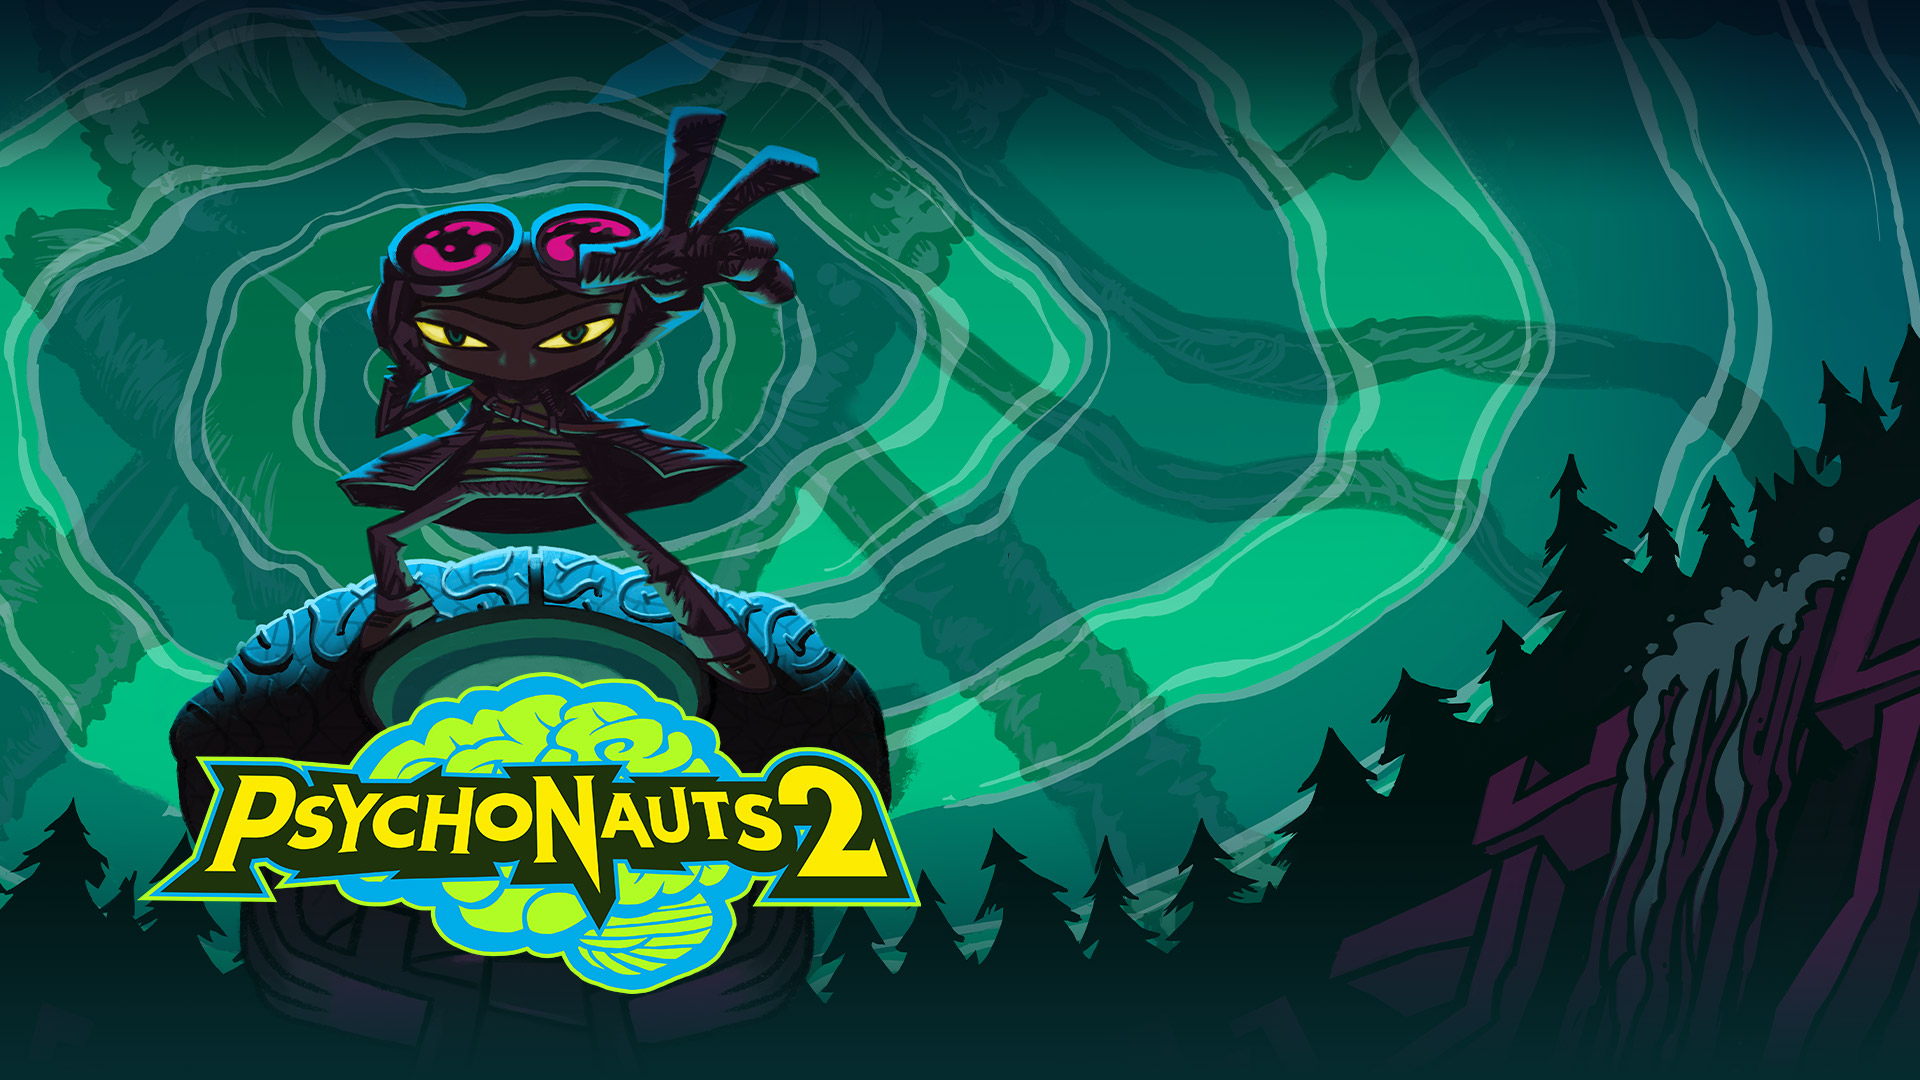 Psychonauts 2, Ο Raz στέκεται με το χέρι απλωμένο μπροστά σε ένα σκοτεινό δάσος και έναν πράσινο ουρανό